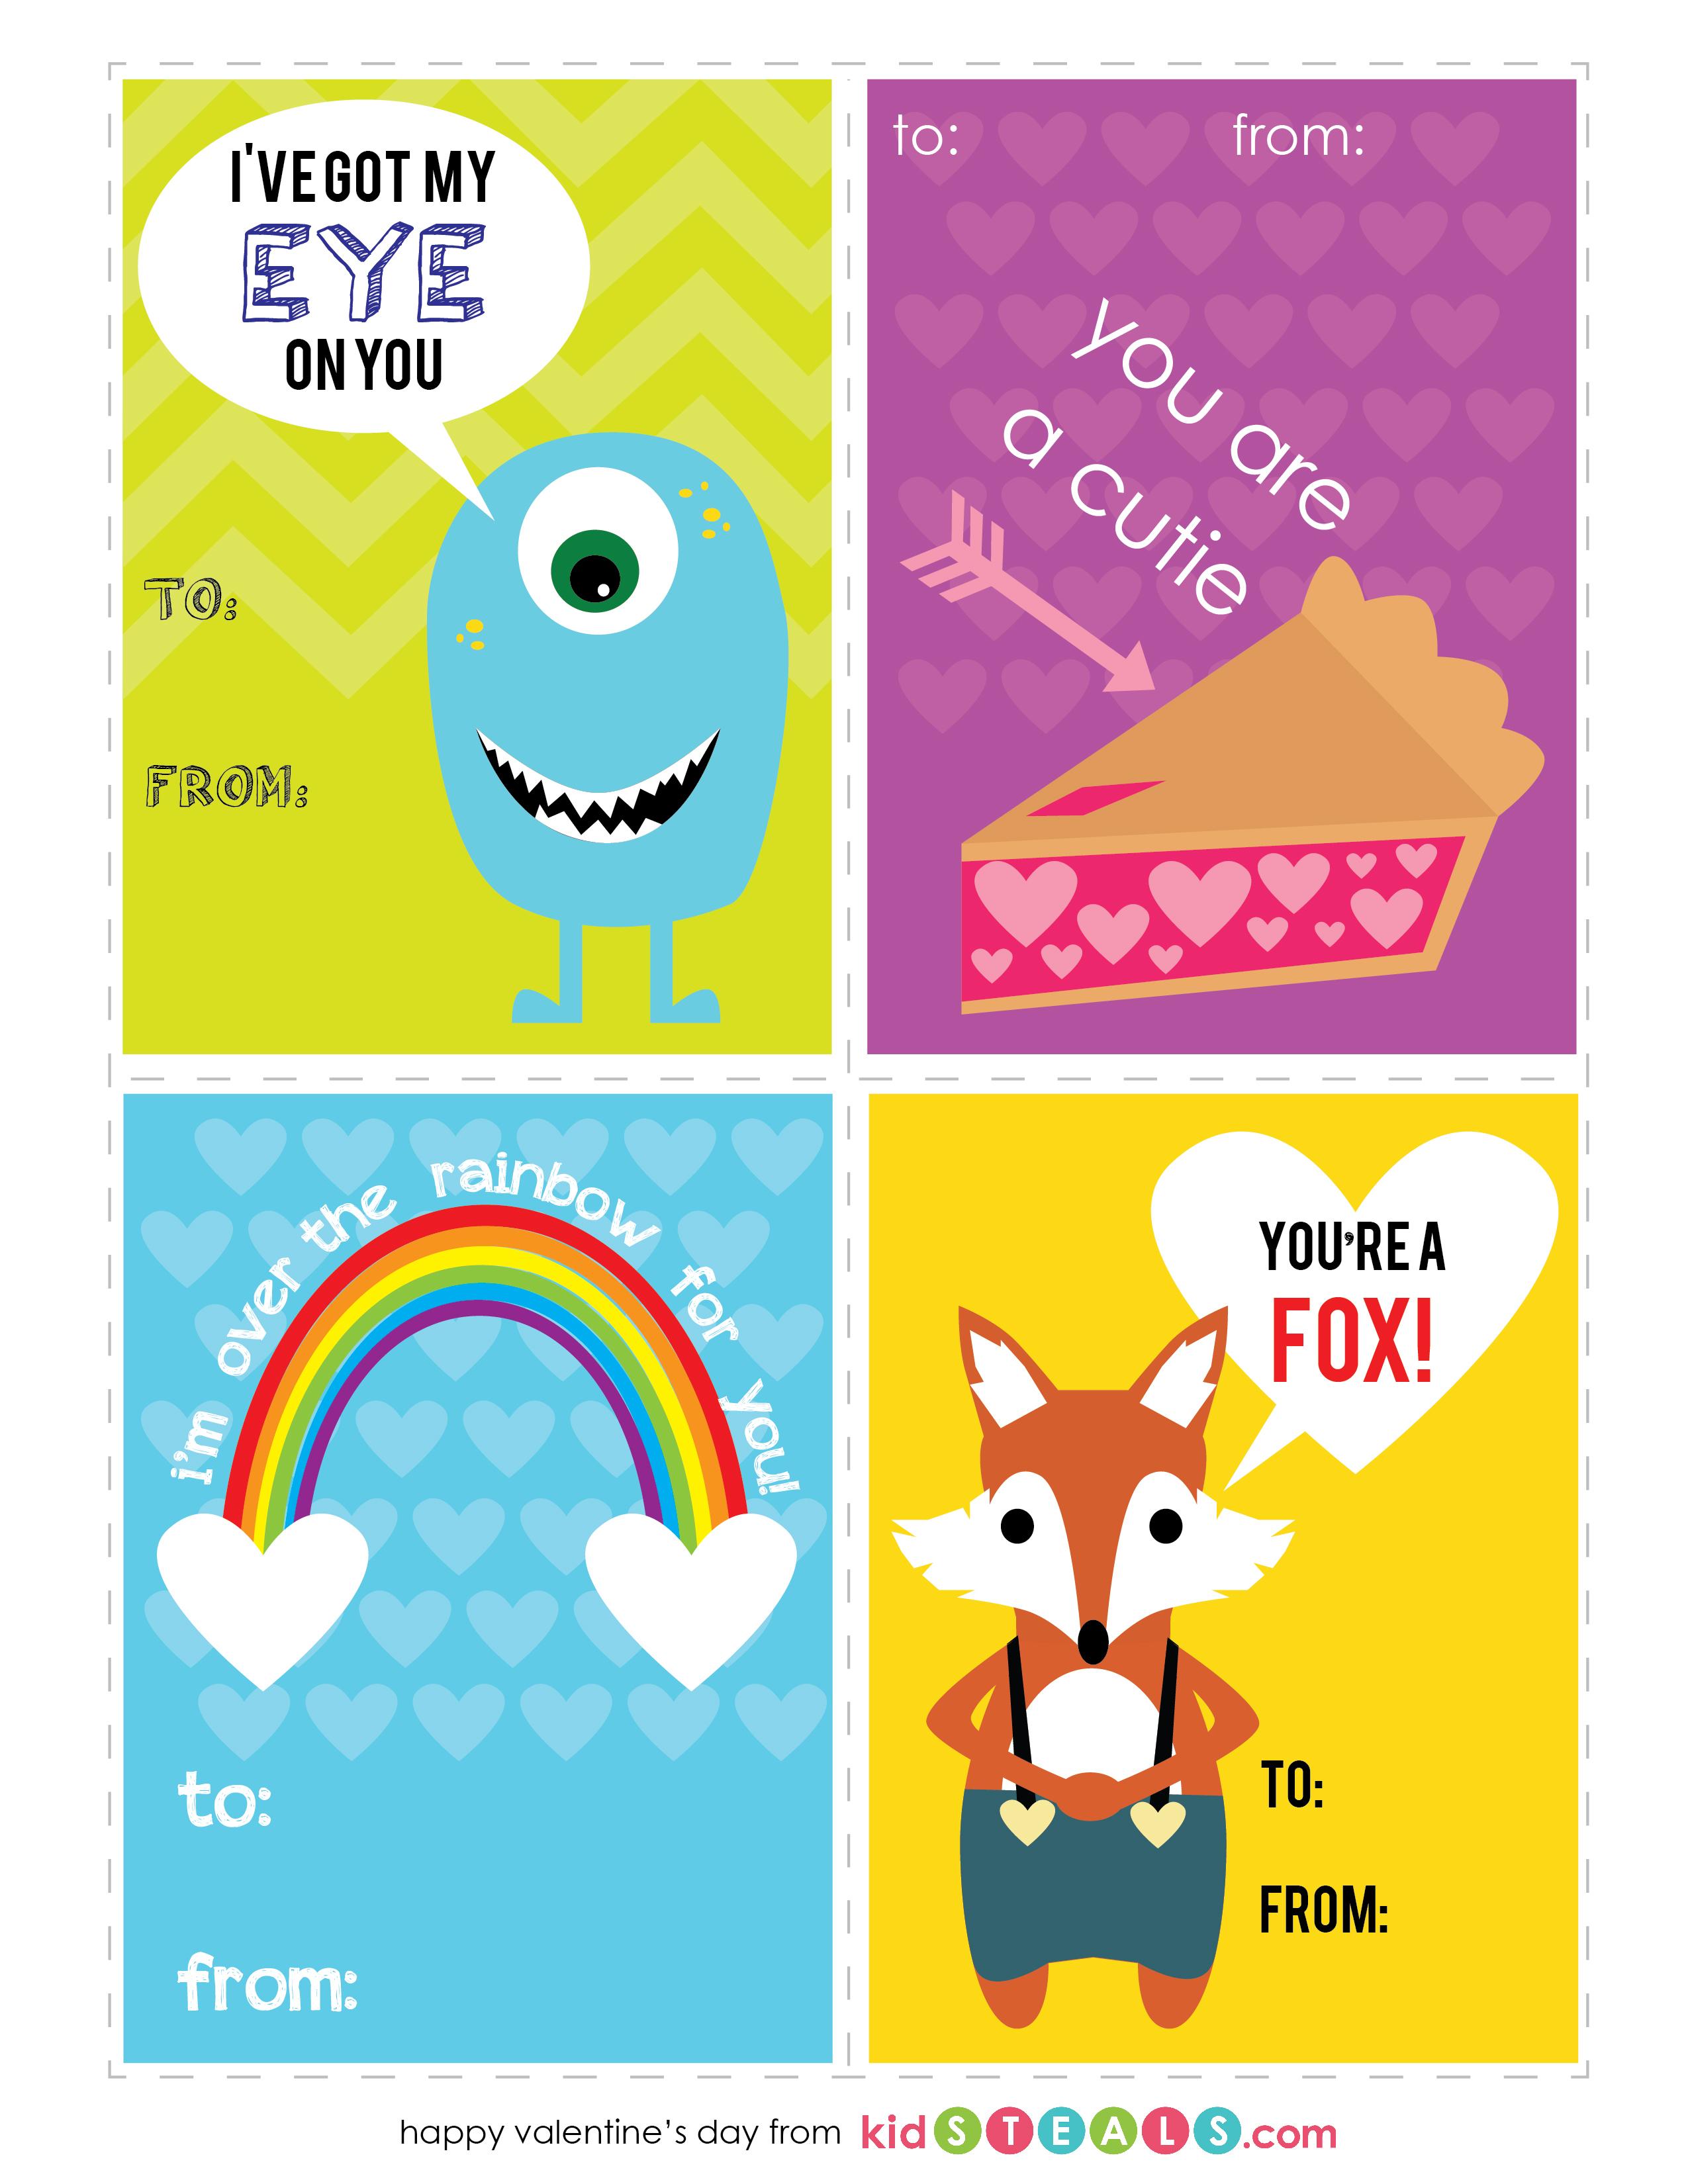 Free Valentines Printables For Kids | Kidsteals - Free Printable Valentine Cards For Preschoolers